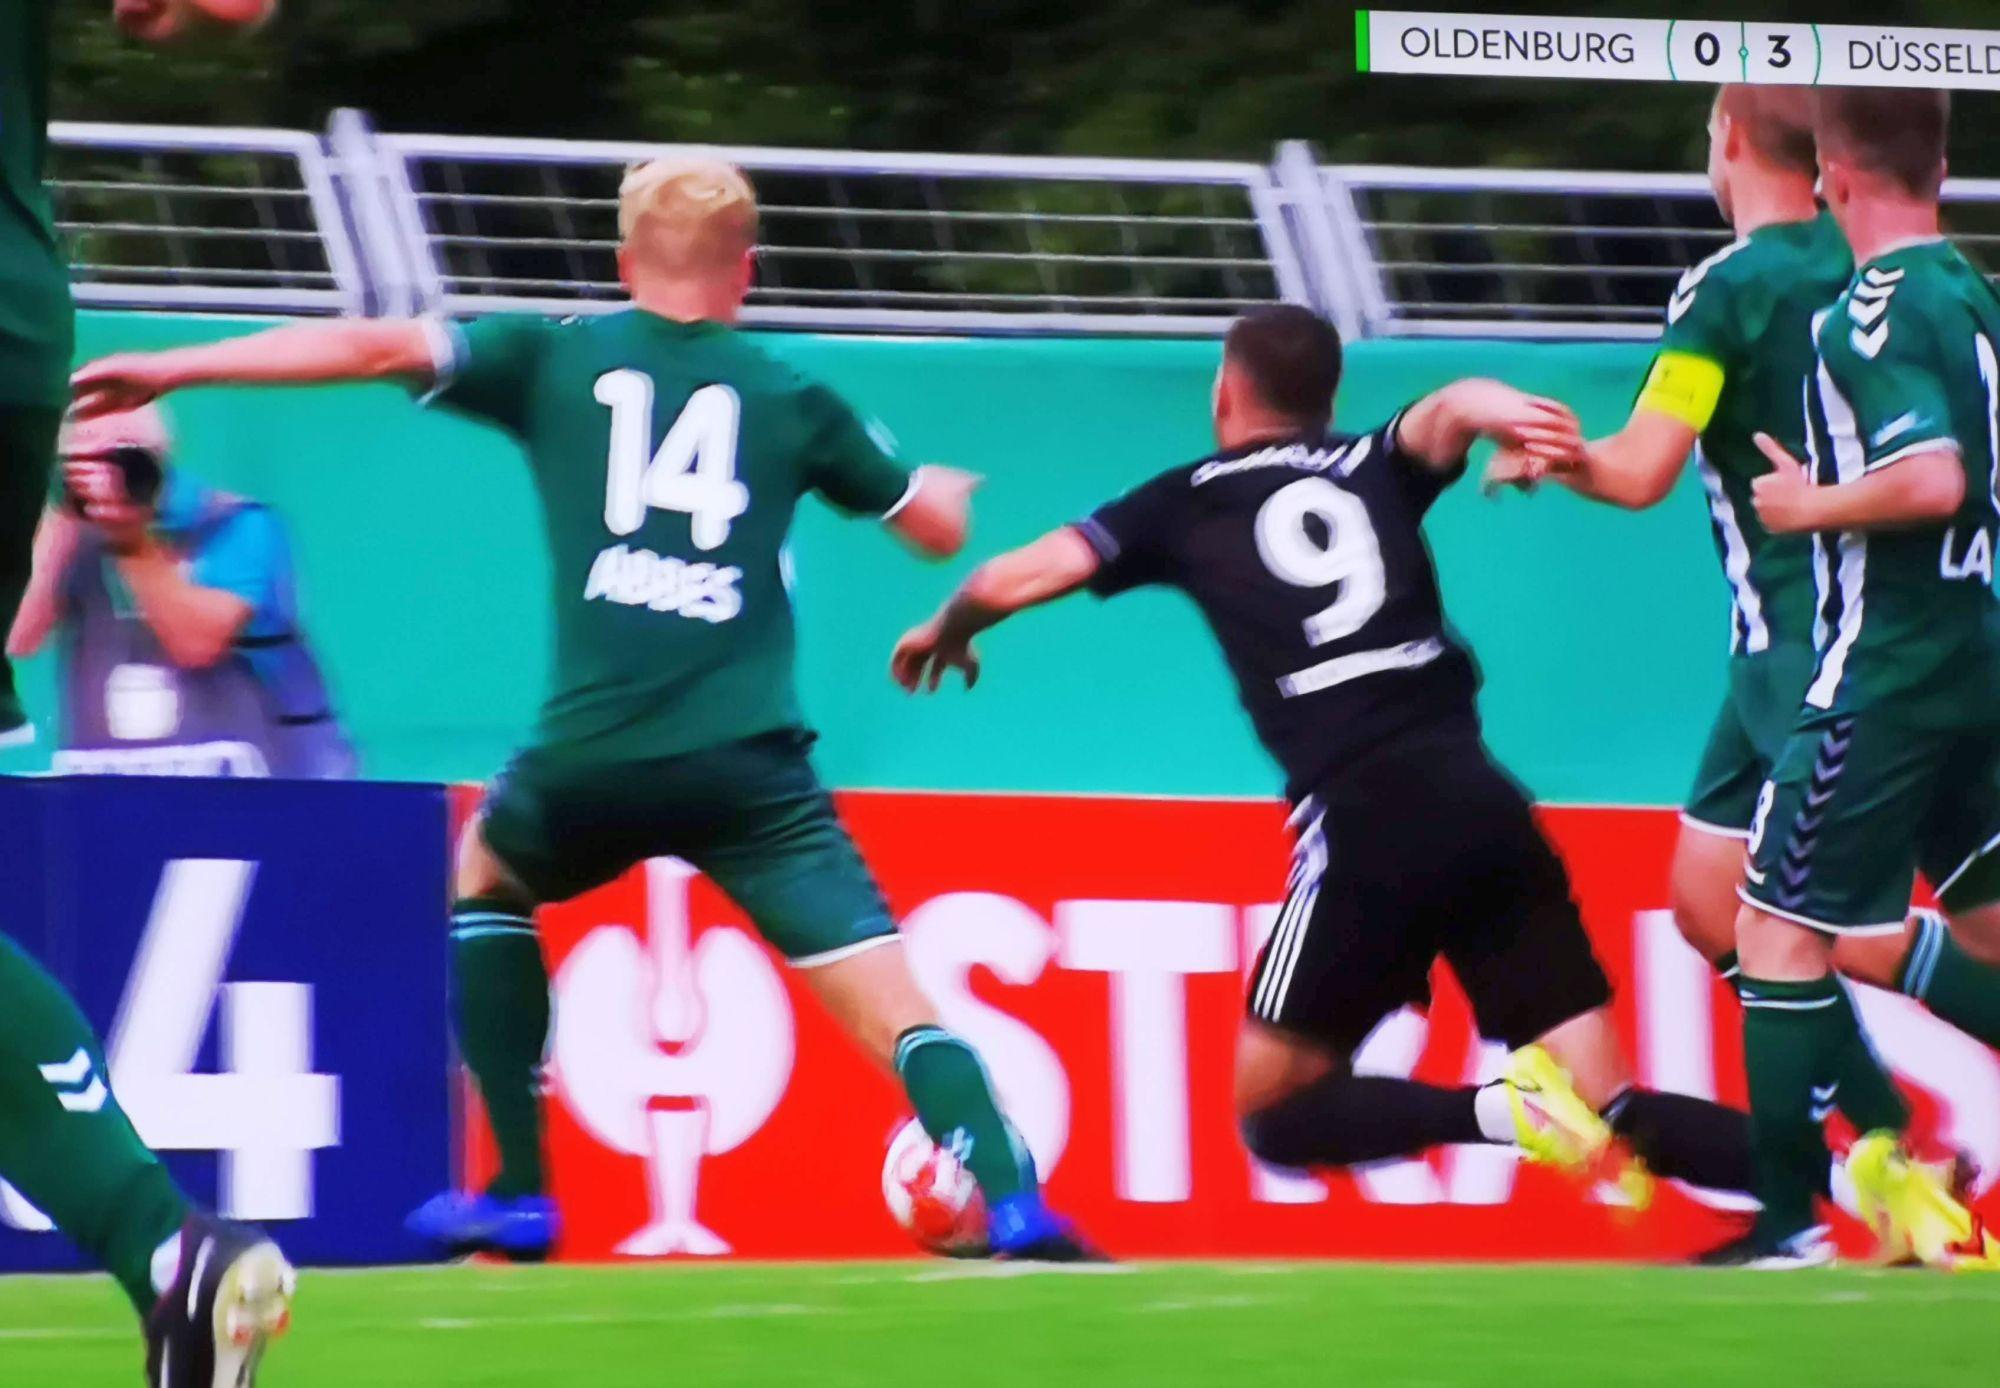 VfL Oldenburg vs F95: Das Foul zum Elfer zum 3:0 (Screenshot Sky)